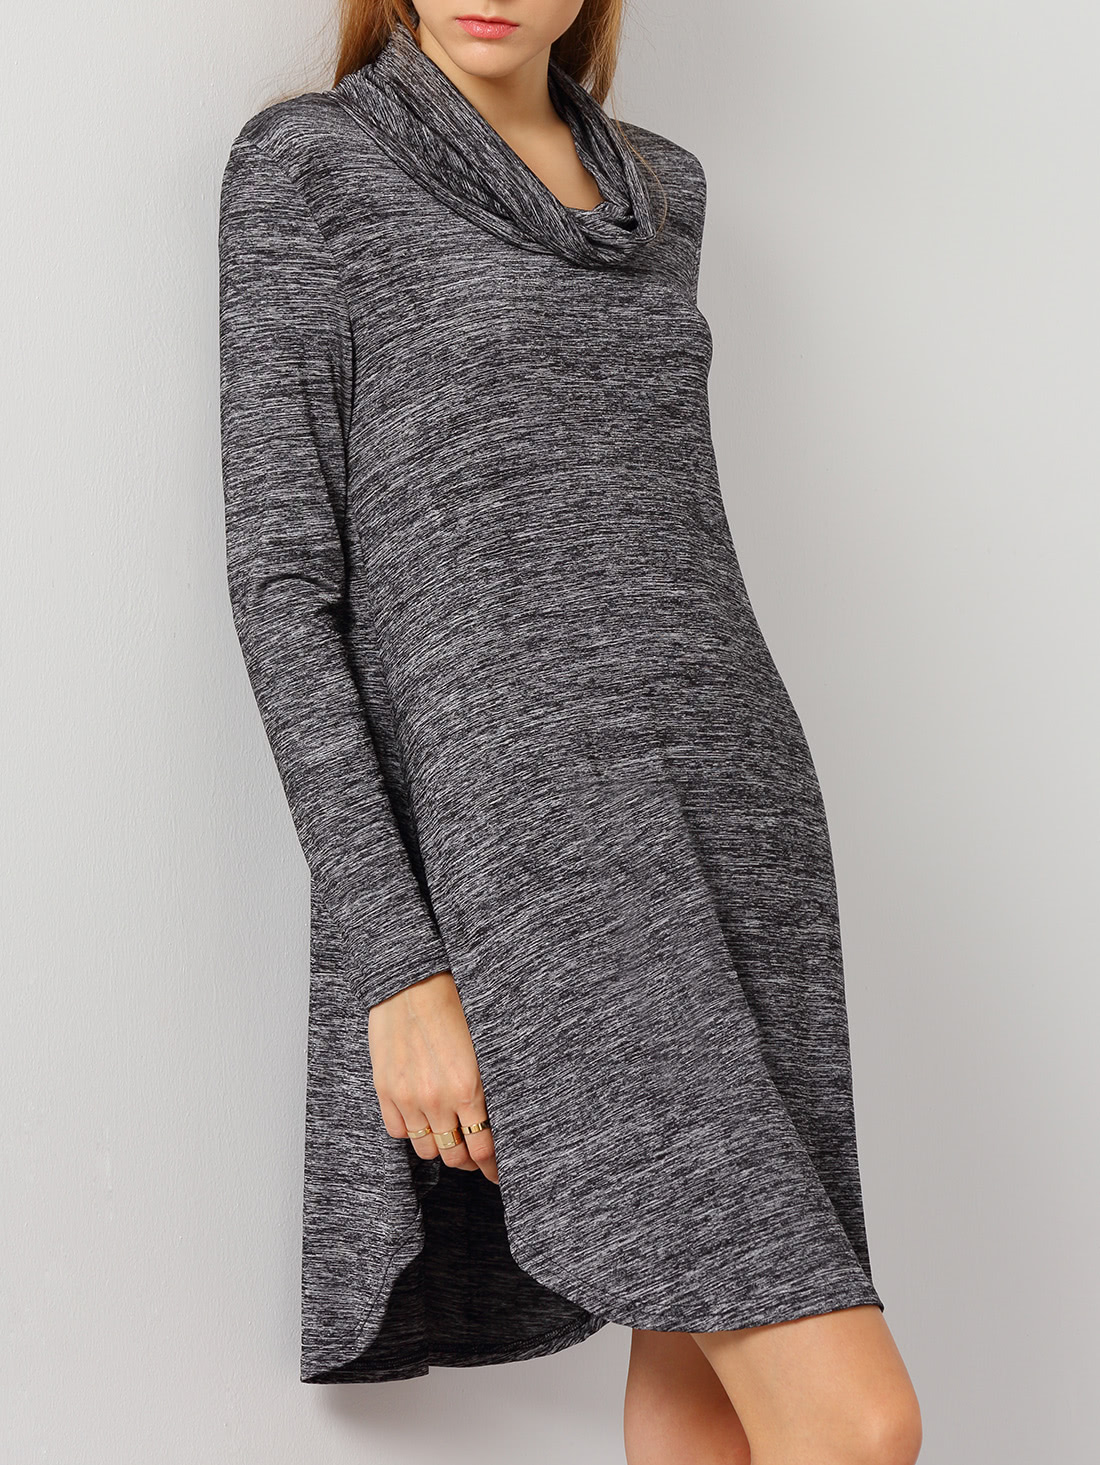 Grey Long Sleeve Turtleneck Dress dress161008591